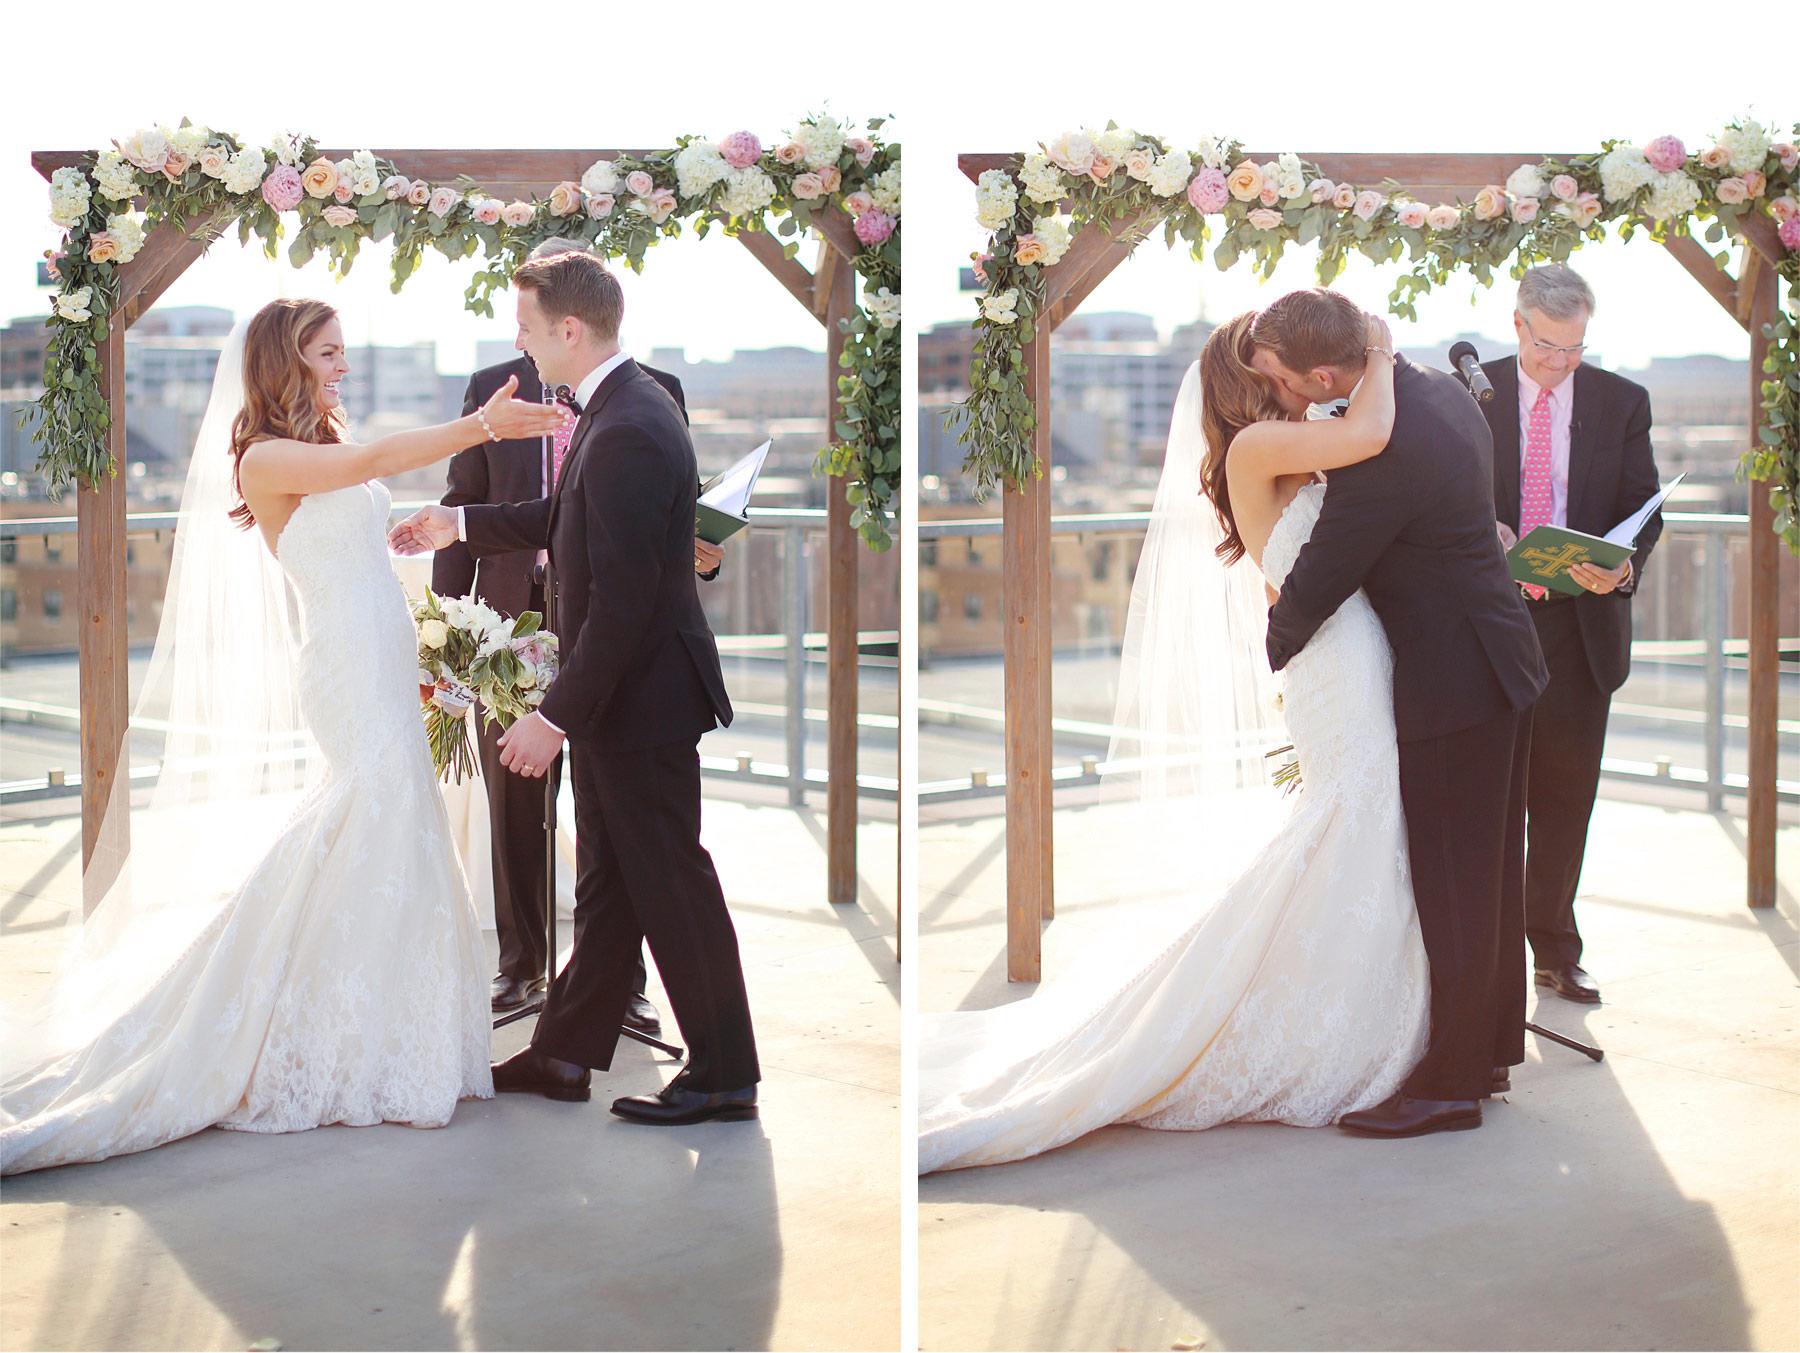 19-Saint-Paul-Minnesota-Wedding-Photographer-by-Andrew-Vick-Photography-Summer-Abulae-Ceremony-Bride-Groom-Kiss-Dress-Molly-and-Dan.jpg